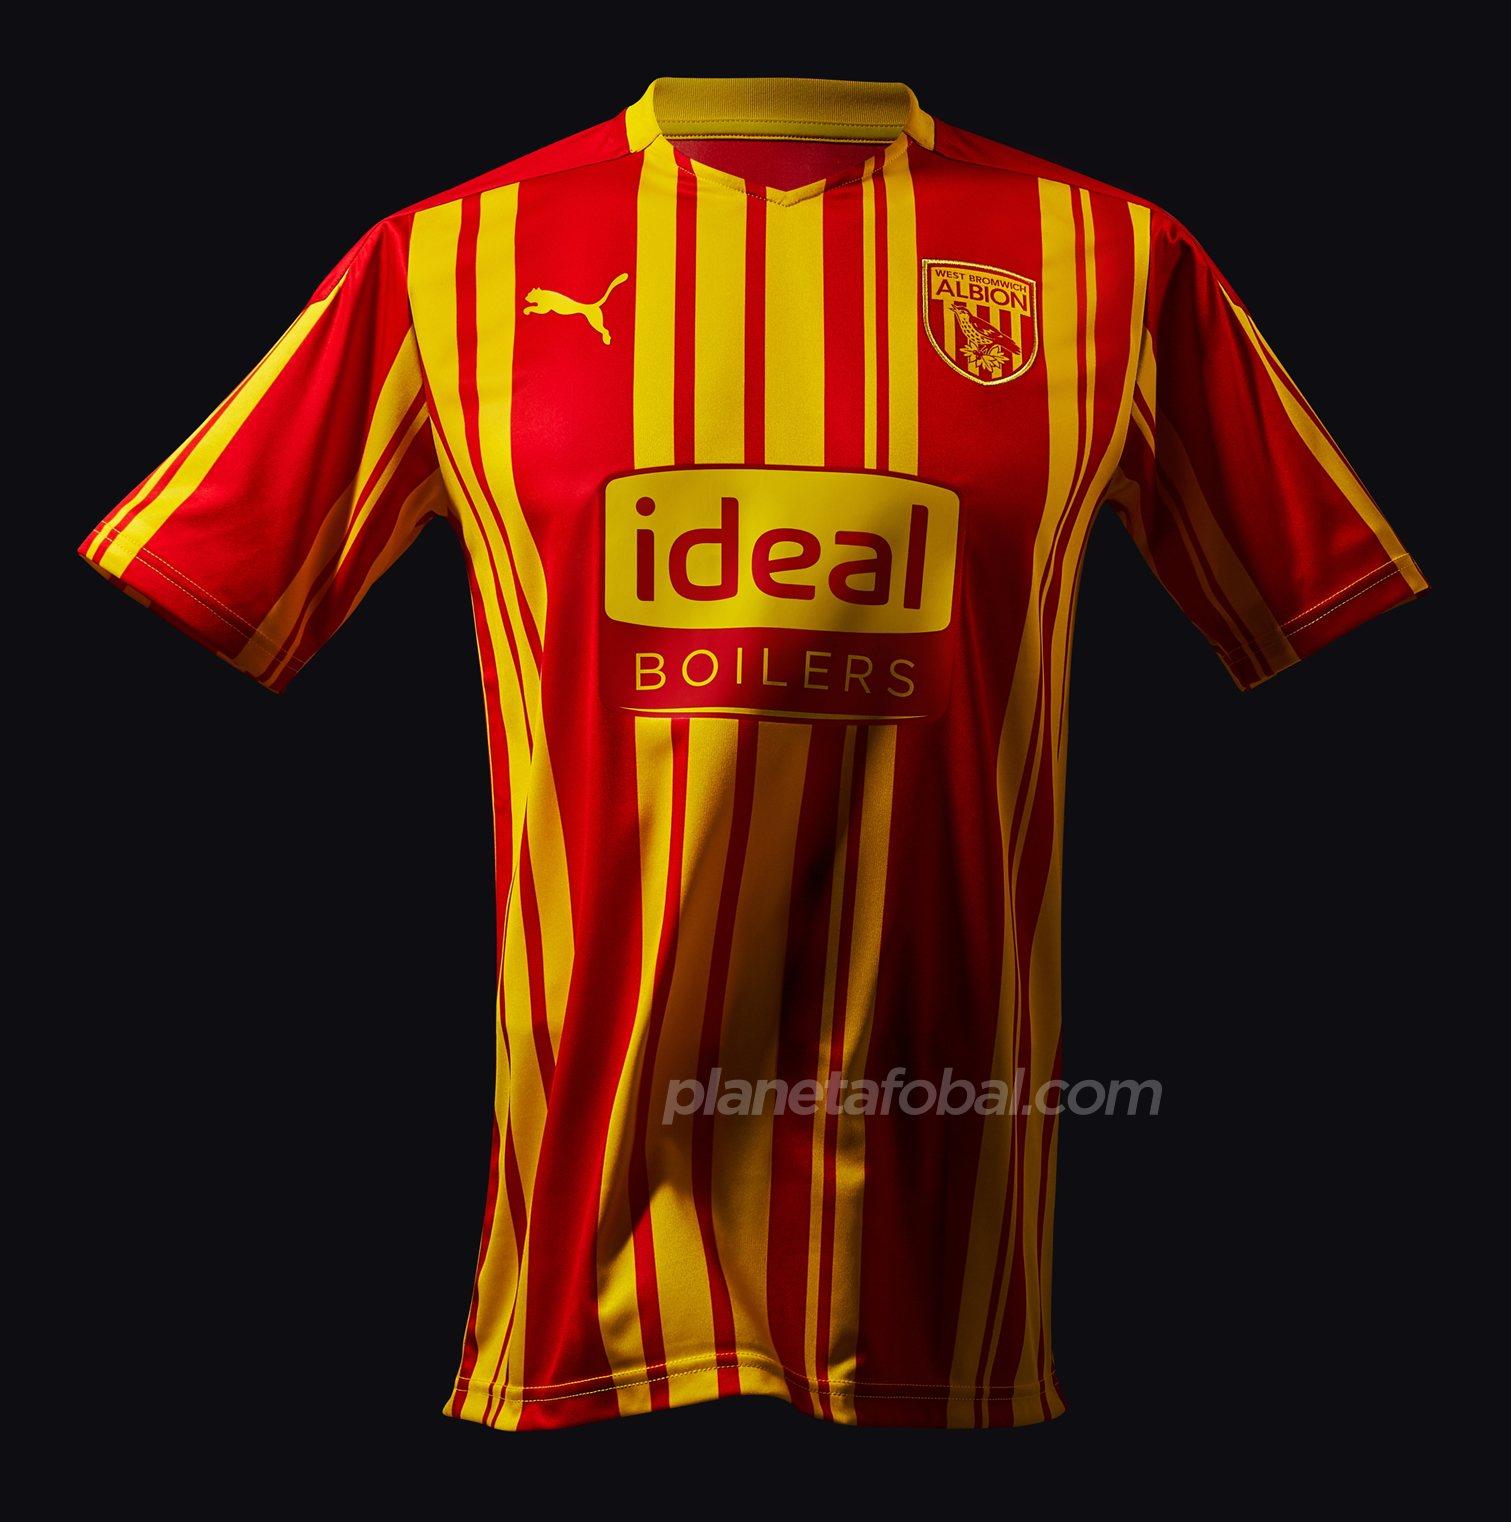 Tercera camiseta Puma del West Bromwich Albion 2020/21 | Imagen Web Oficial